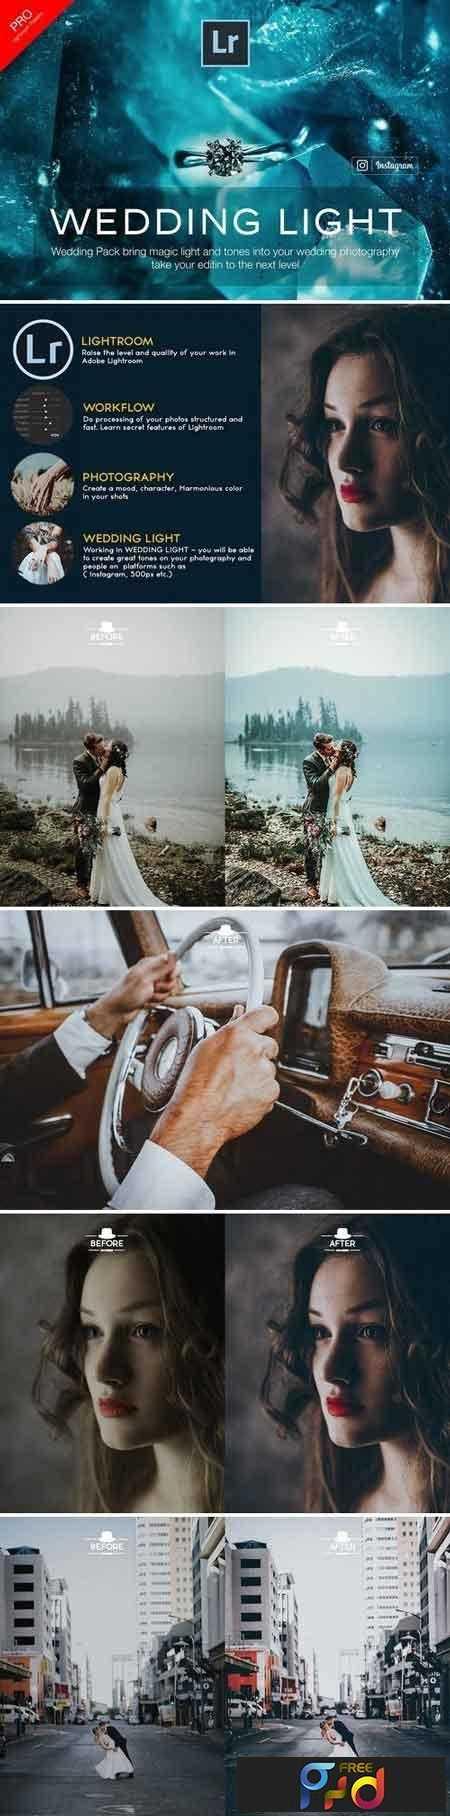 1812184 Wedding Lightroom Presets 2128466 1